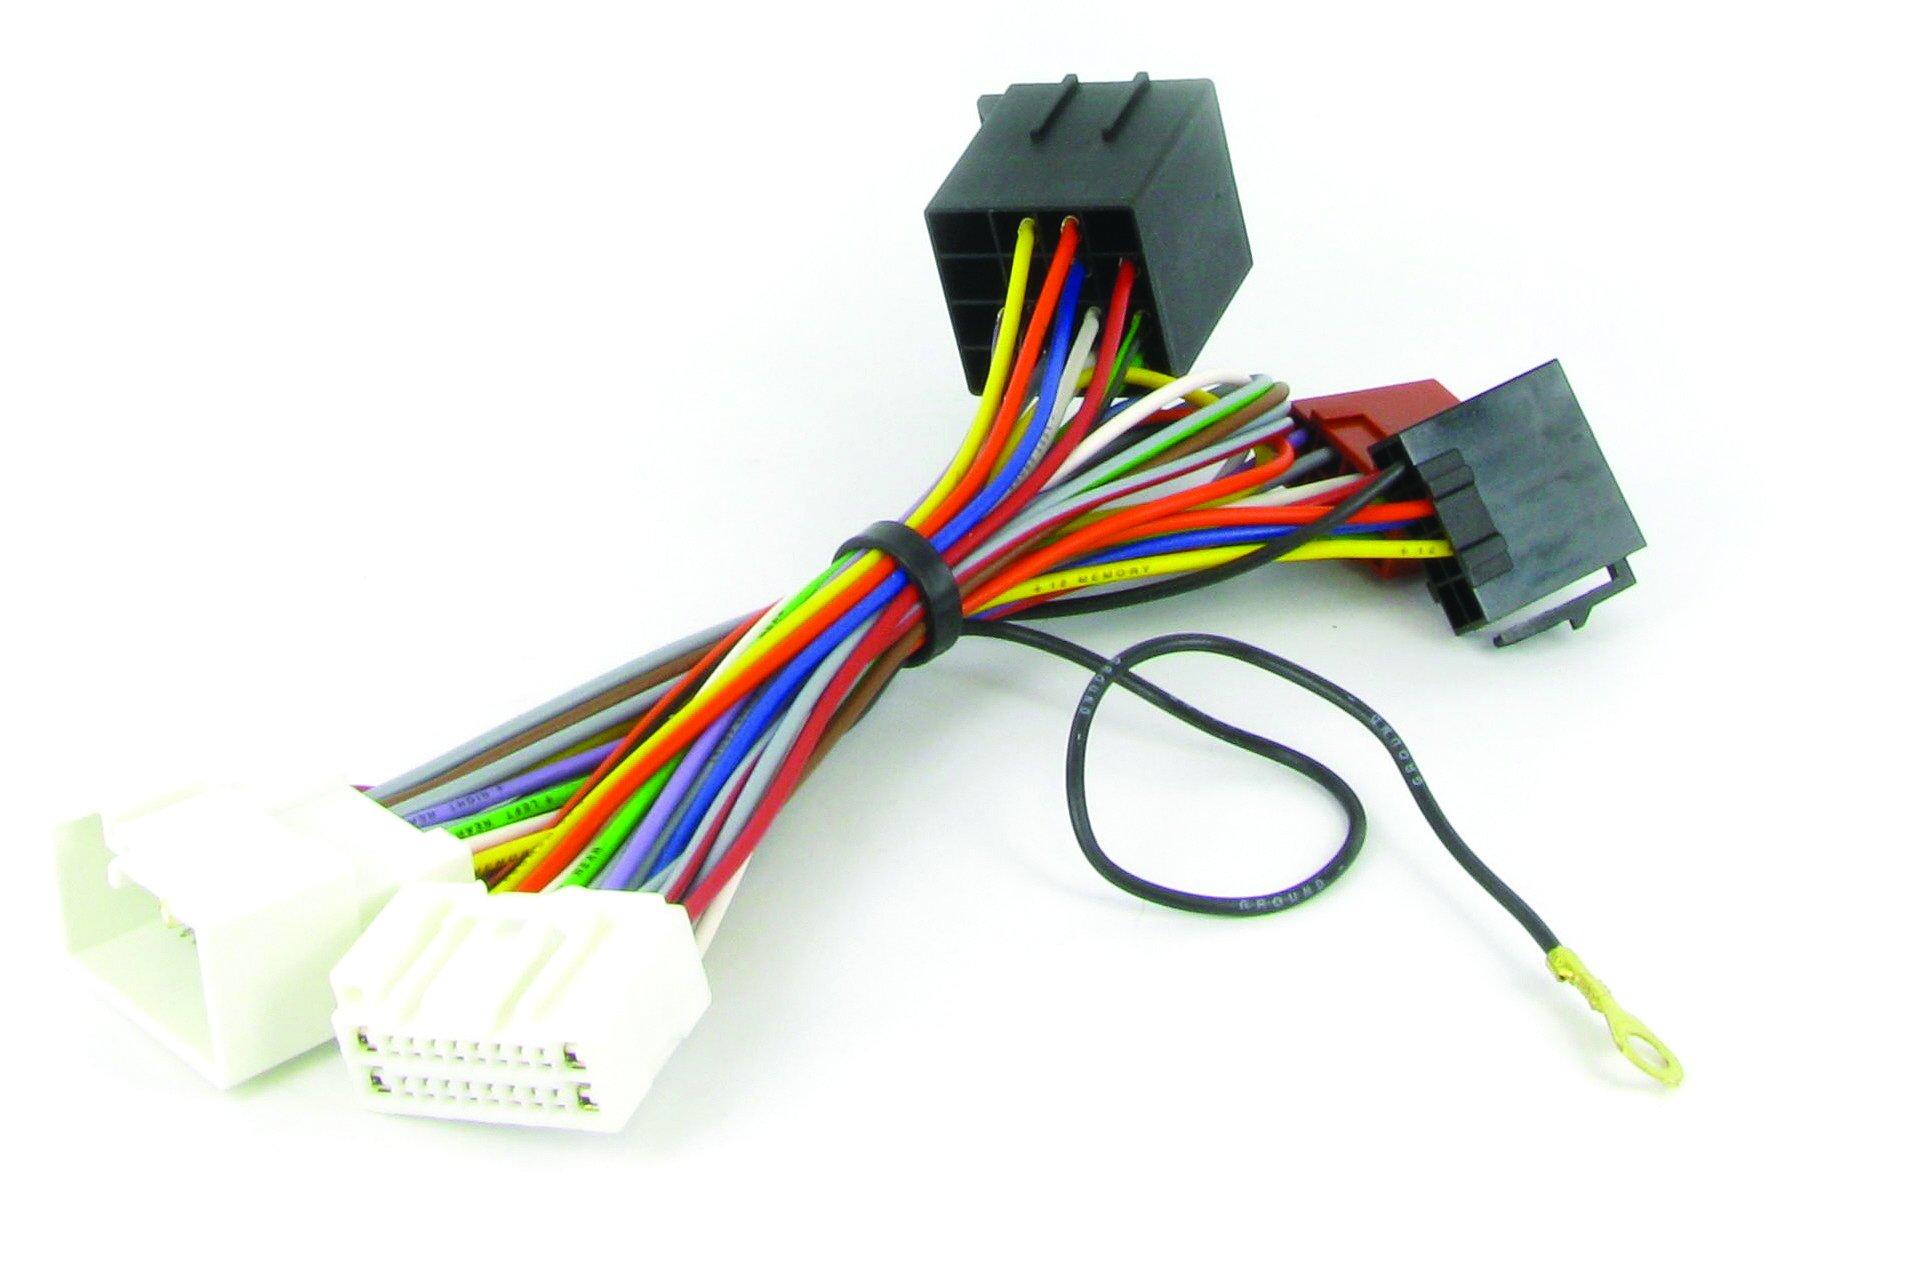 Mitsubishi Triton Trailer Wiring Harness Solutions Audio Wire Kits Mt 117 B4m